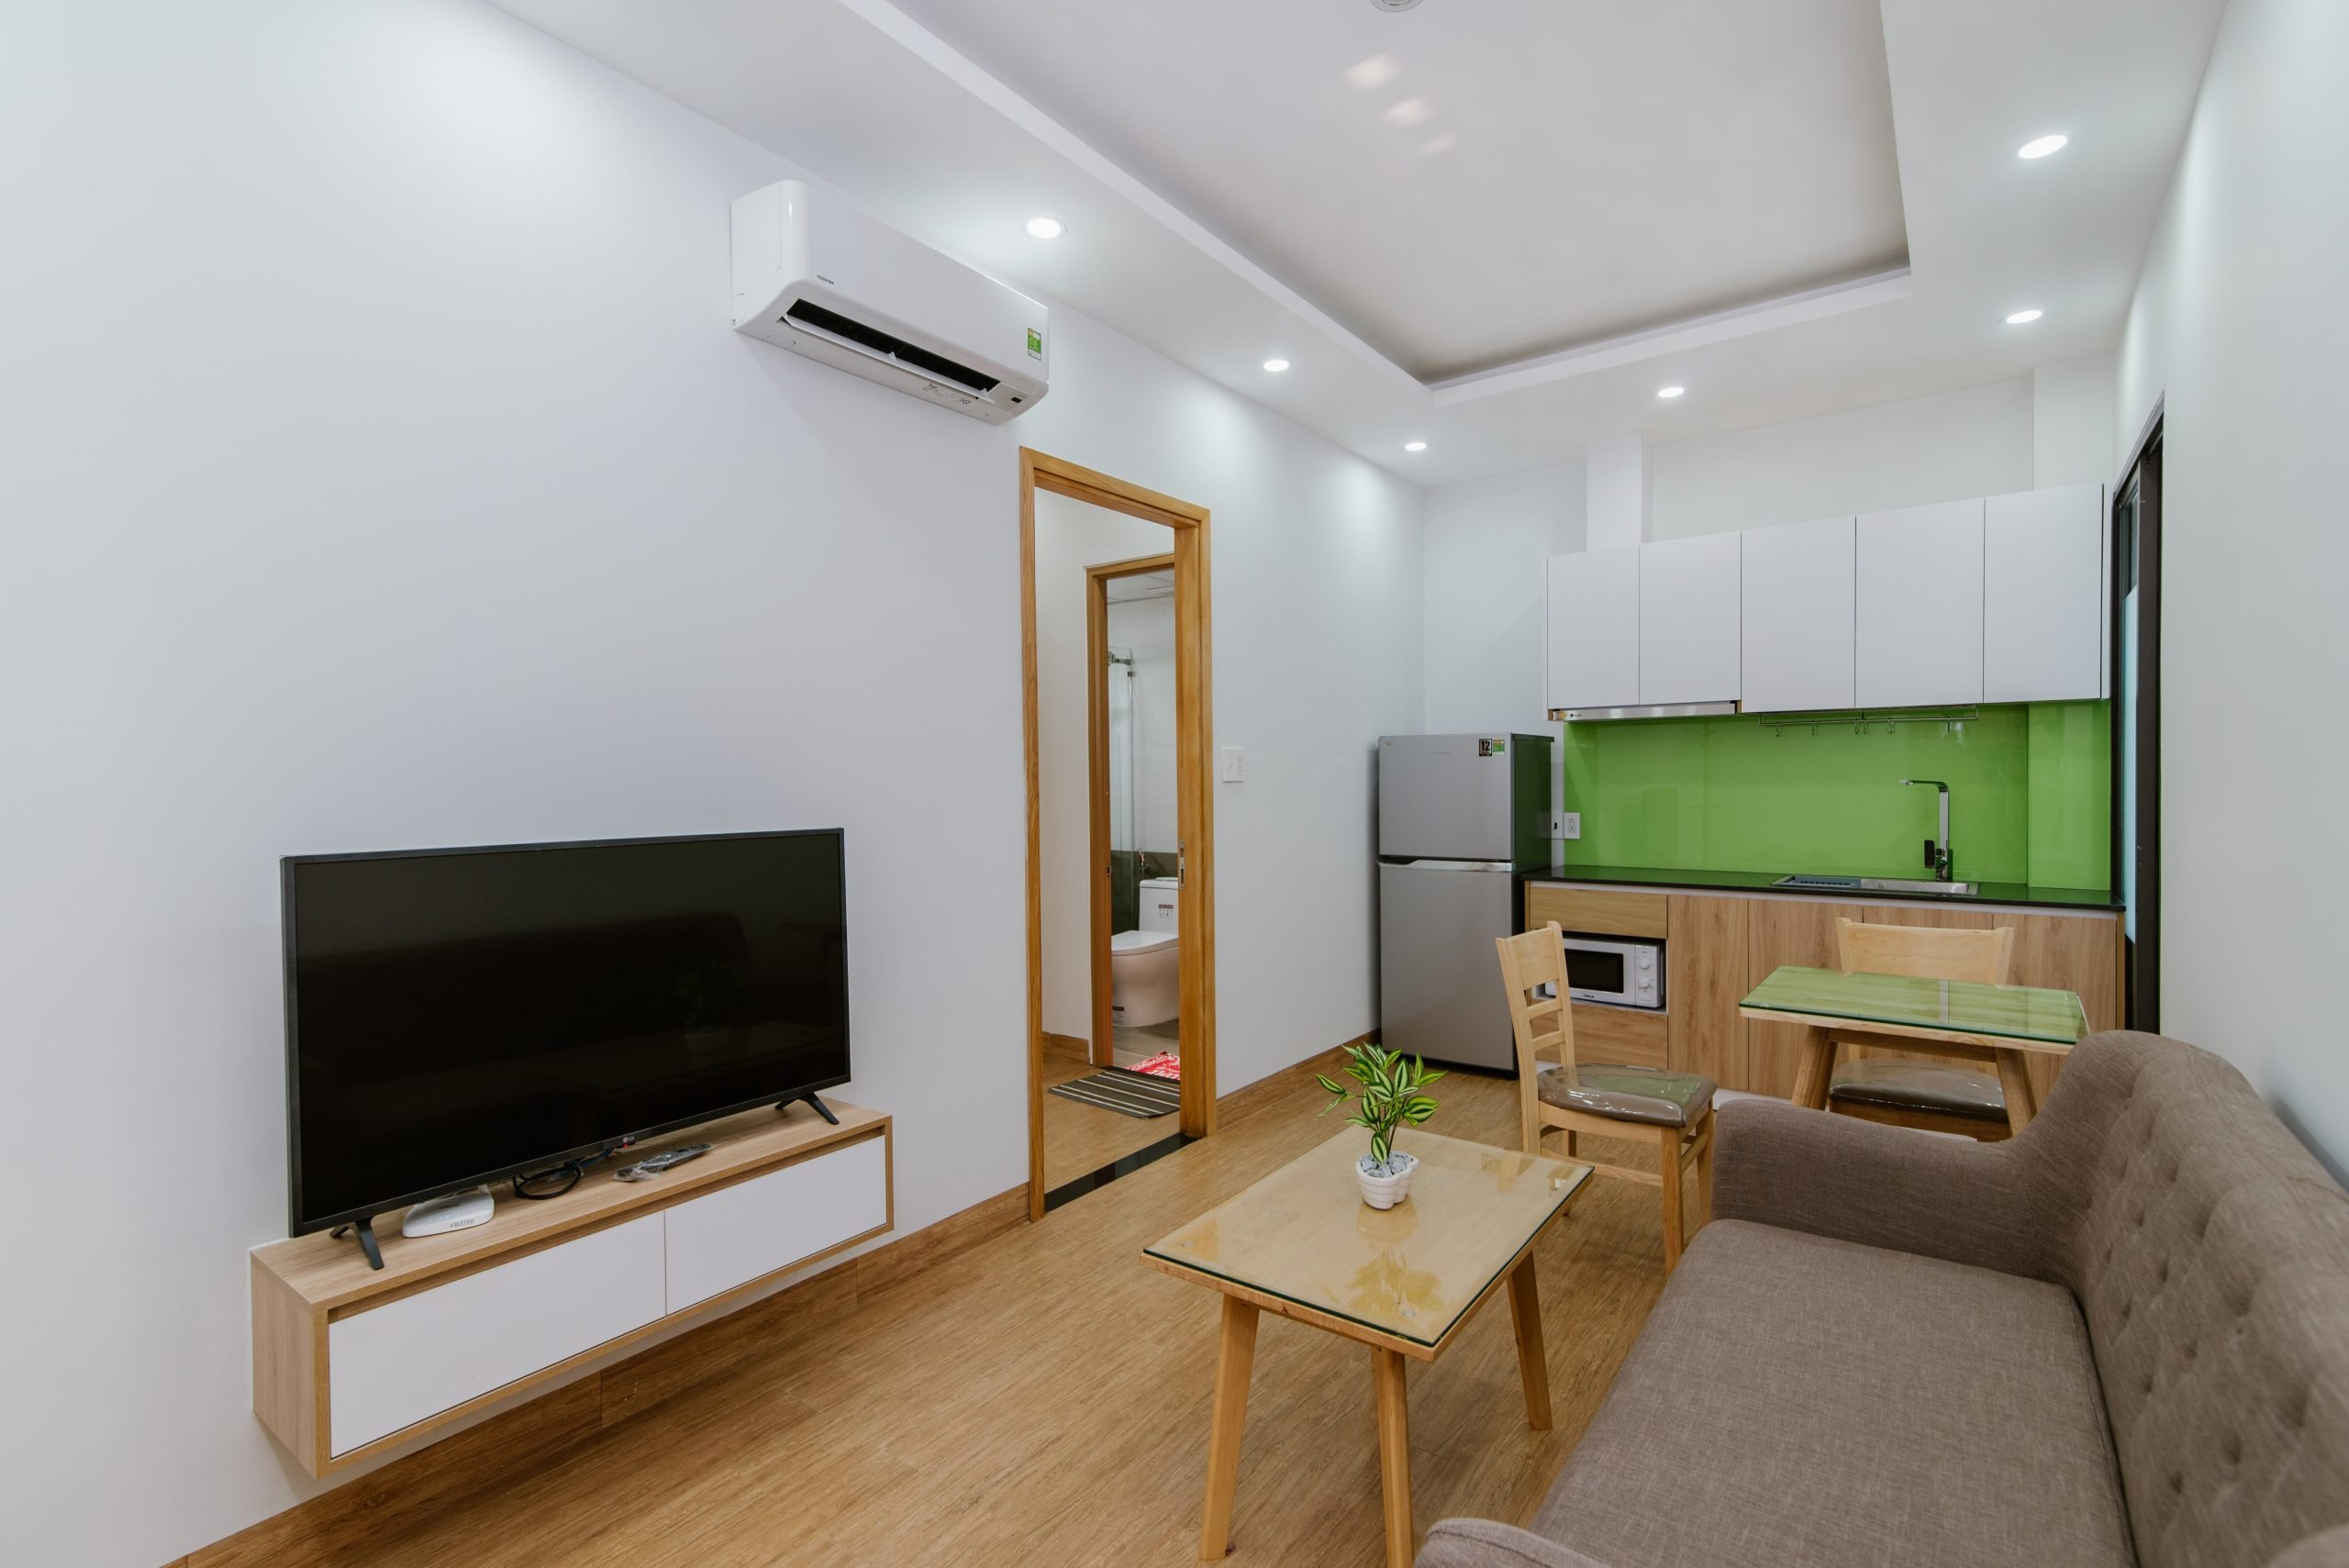 High end 1 bedroom Apartment For Rent near Nguyen Van Thoai Street Da Nang